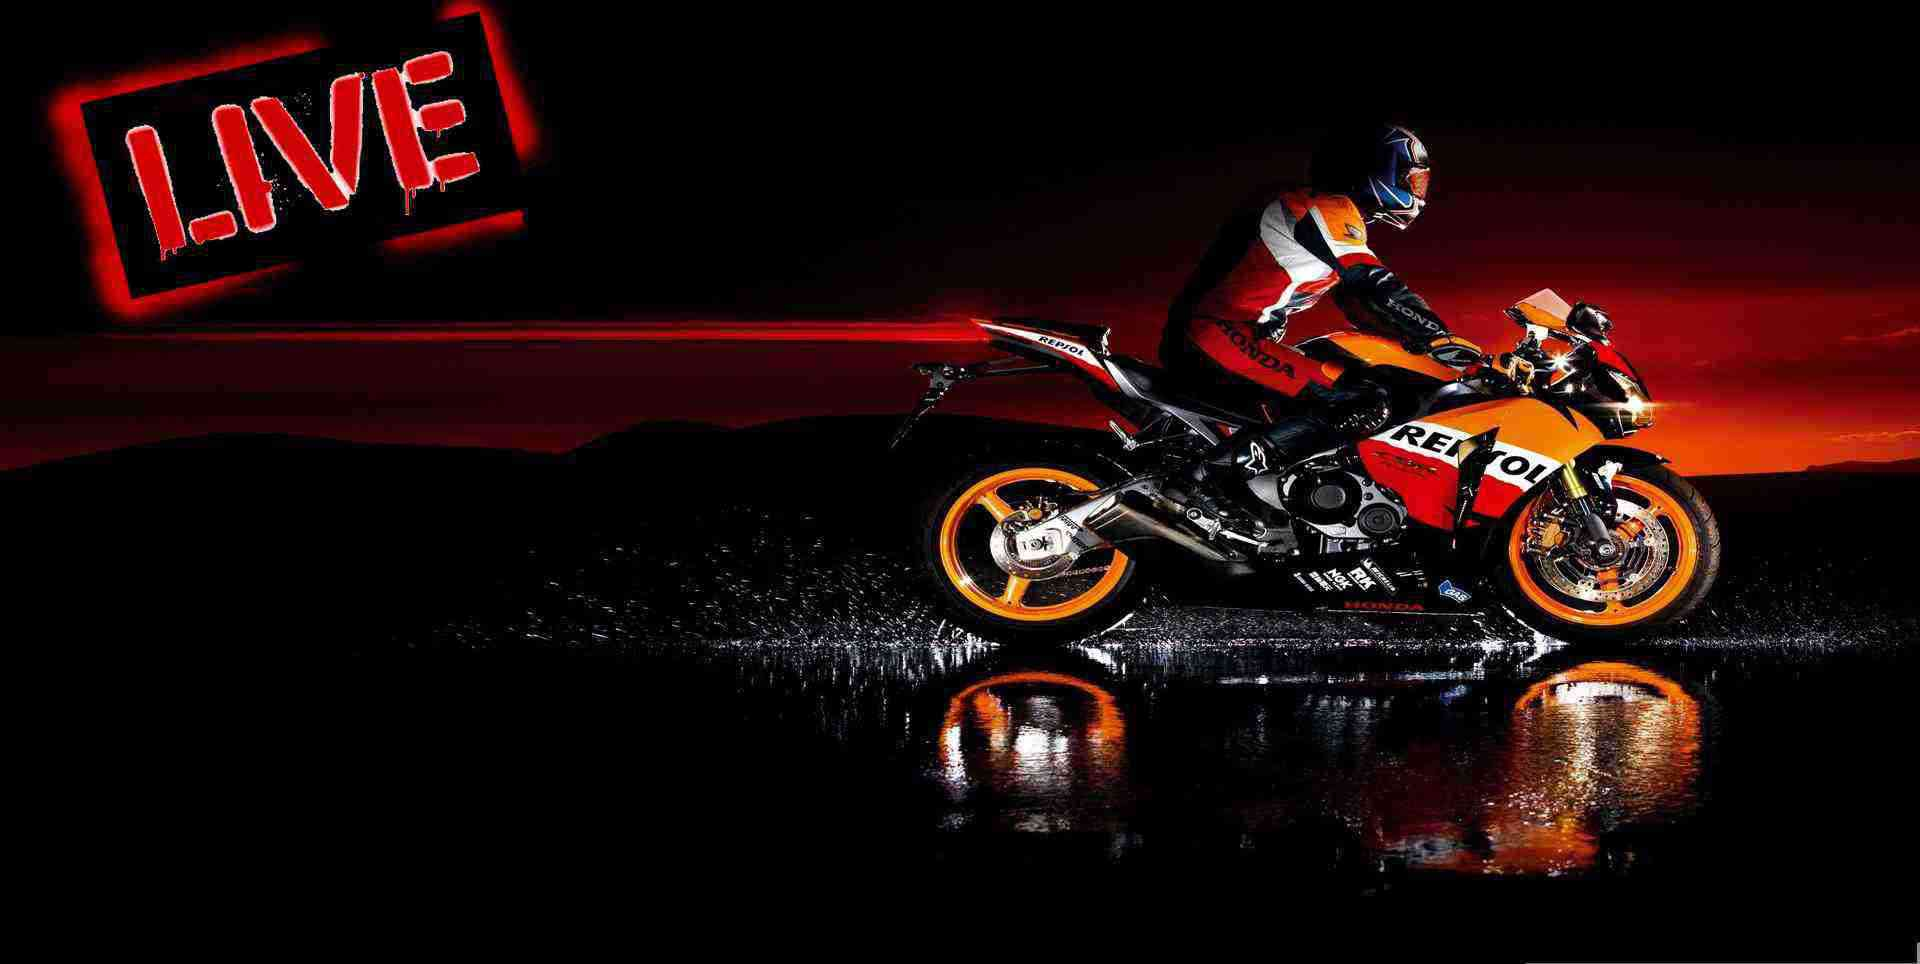 live-online-british-motogp-grand-prix-2017